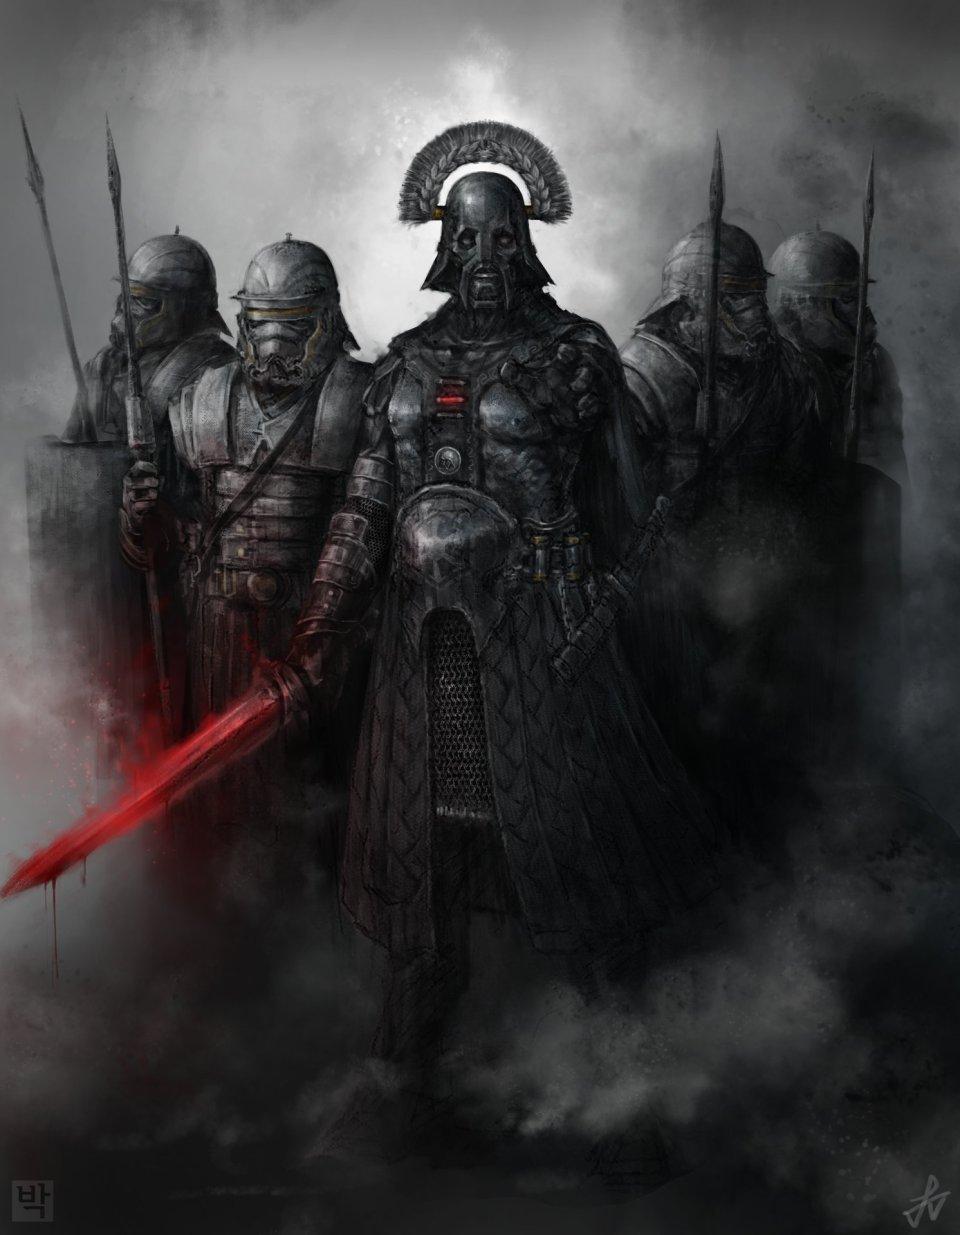 Reimagined Darth Vader